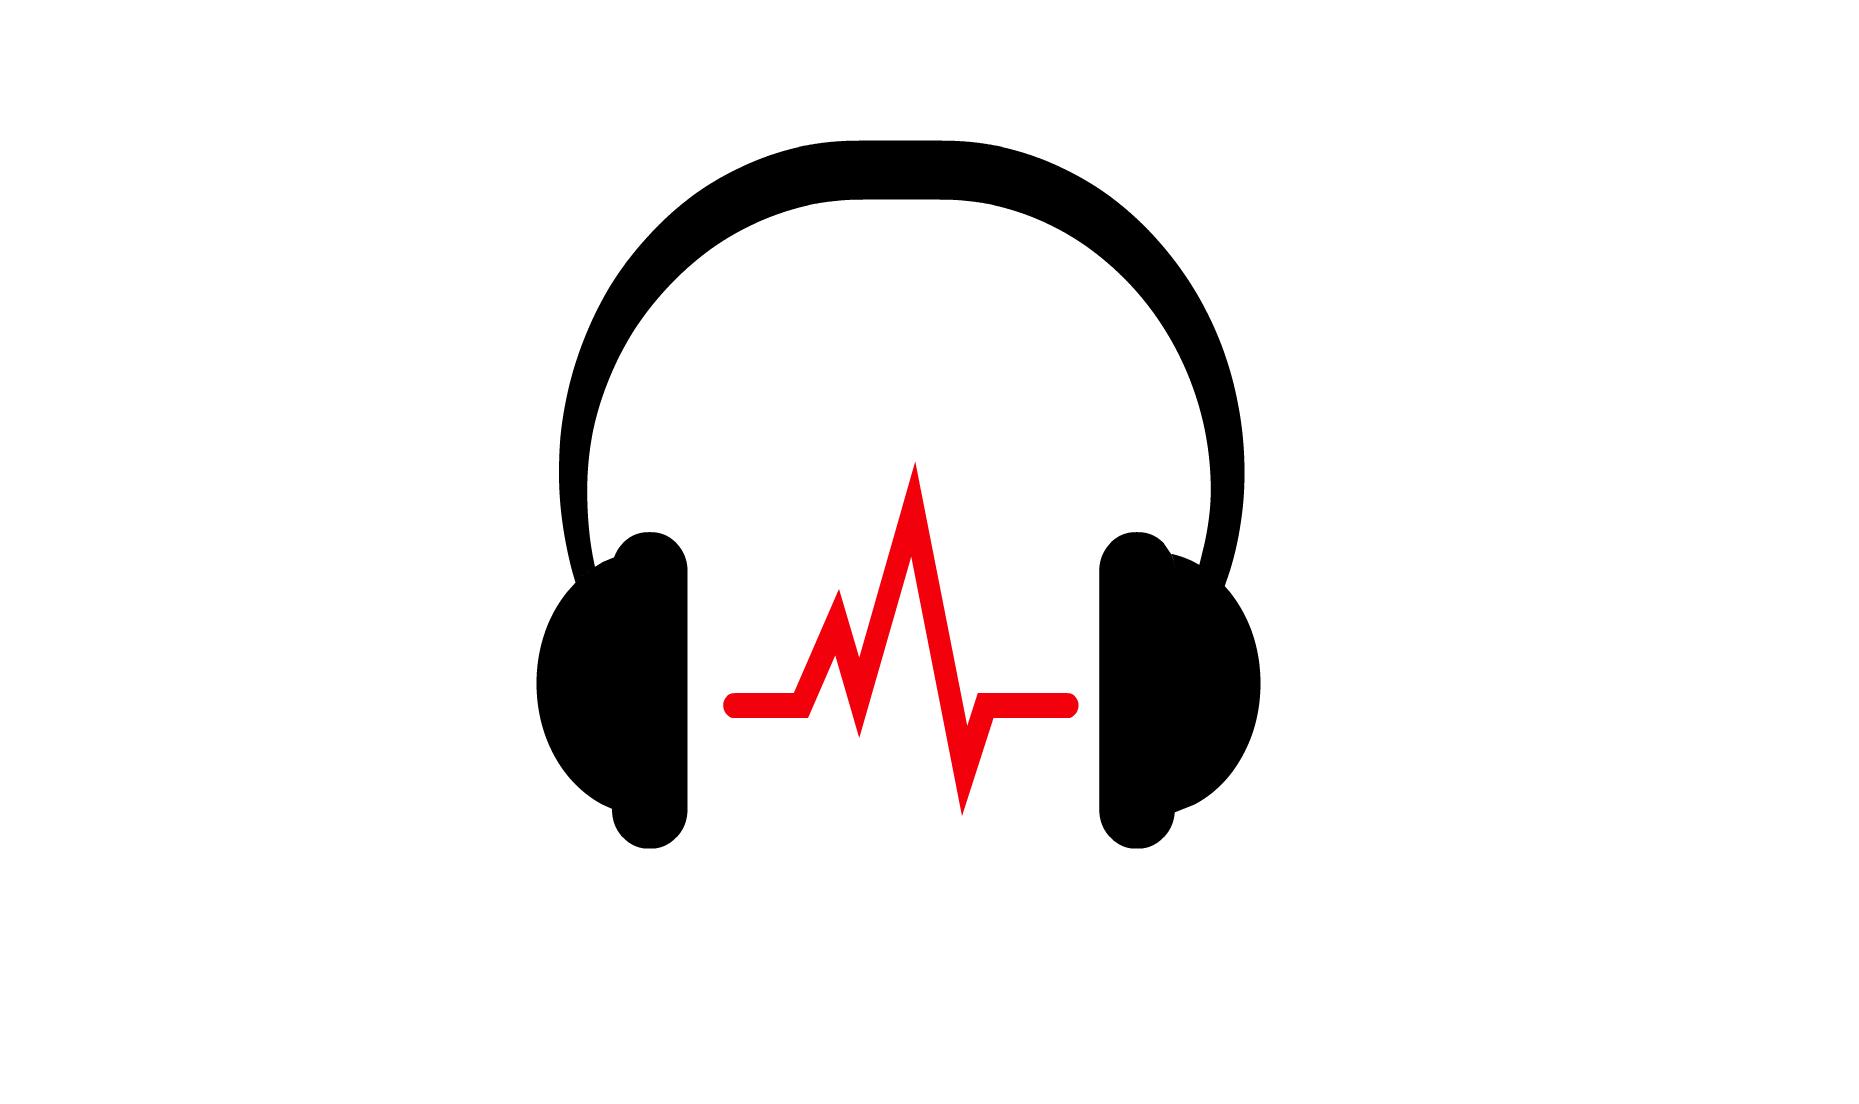 AudiophileBeginners.